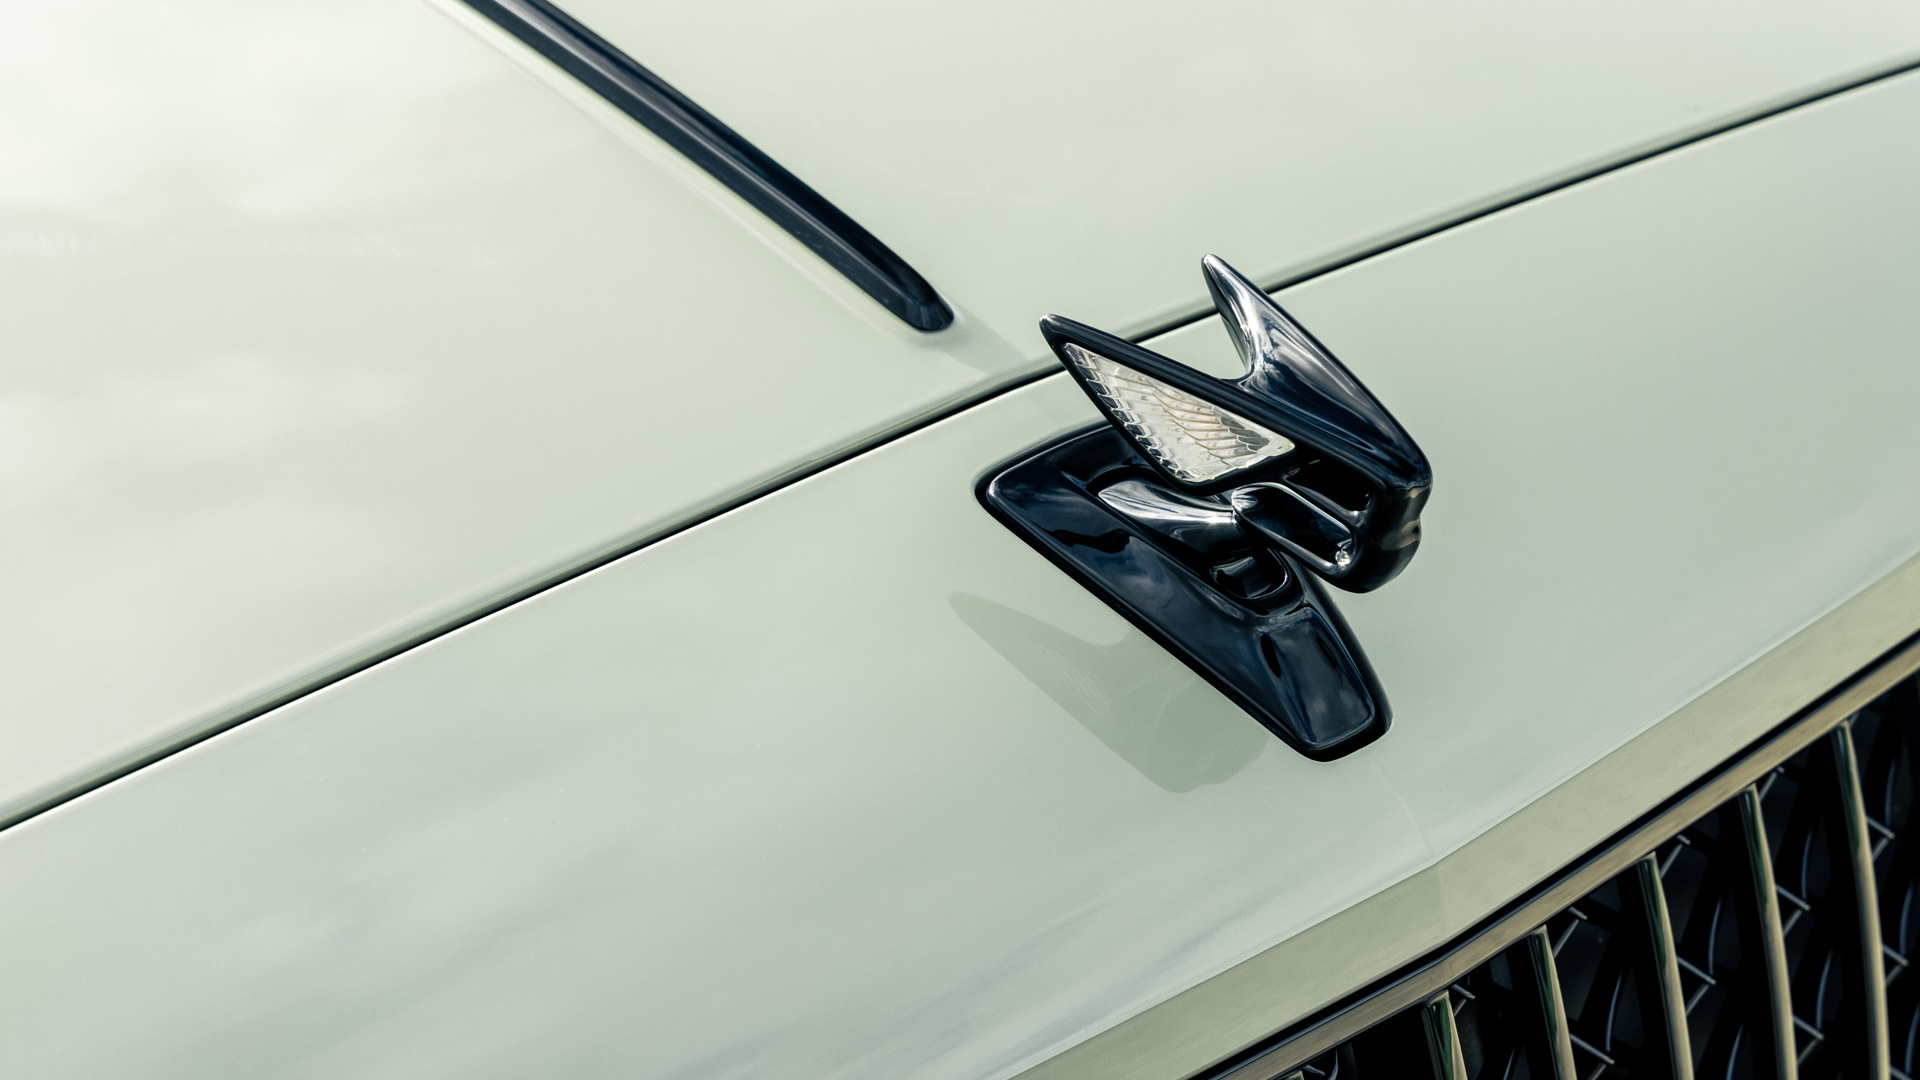 2022 Bentley Flying Spur in Sage Green Heritage Paint